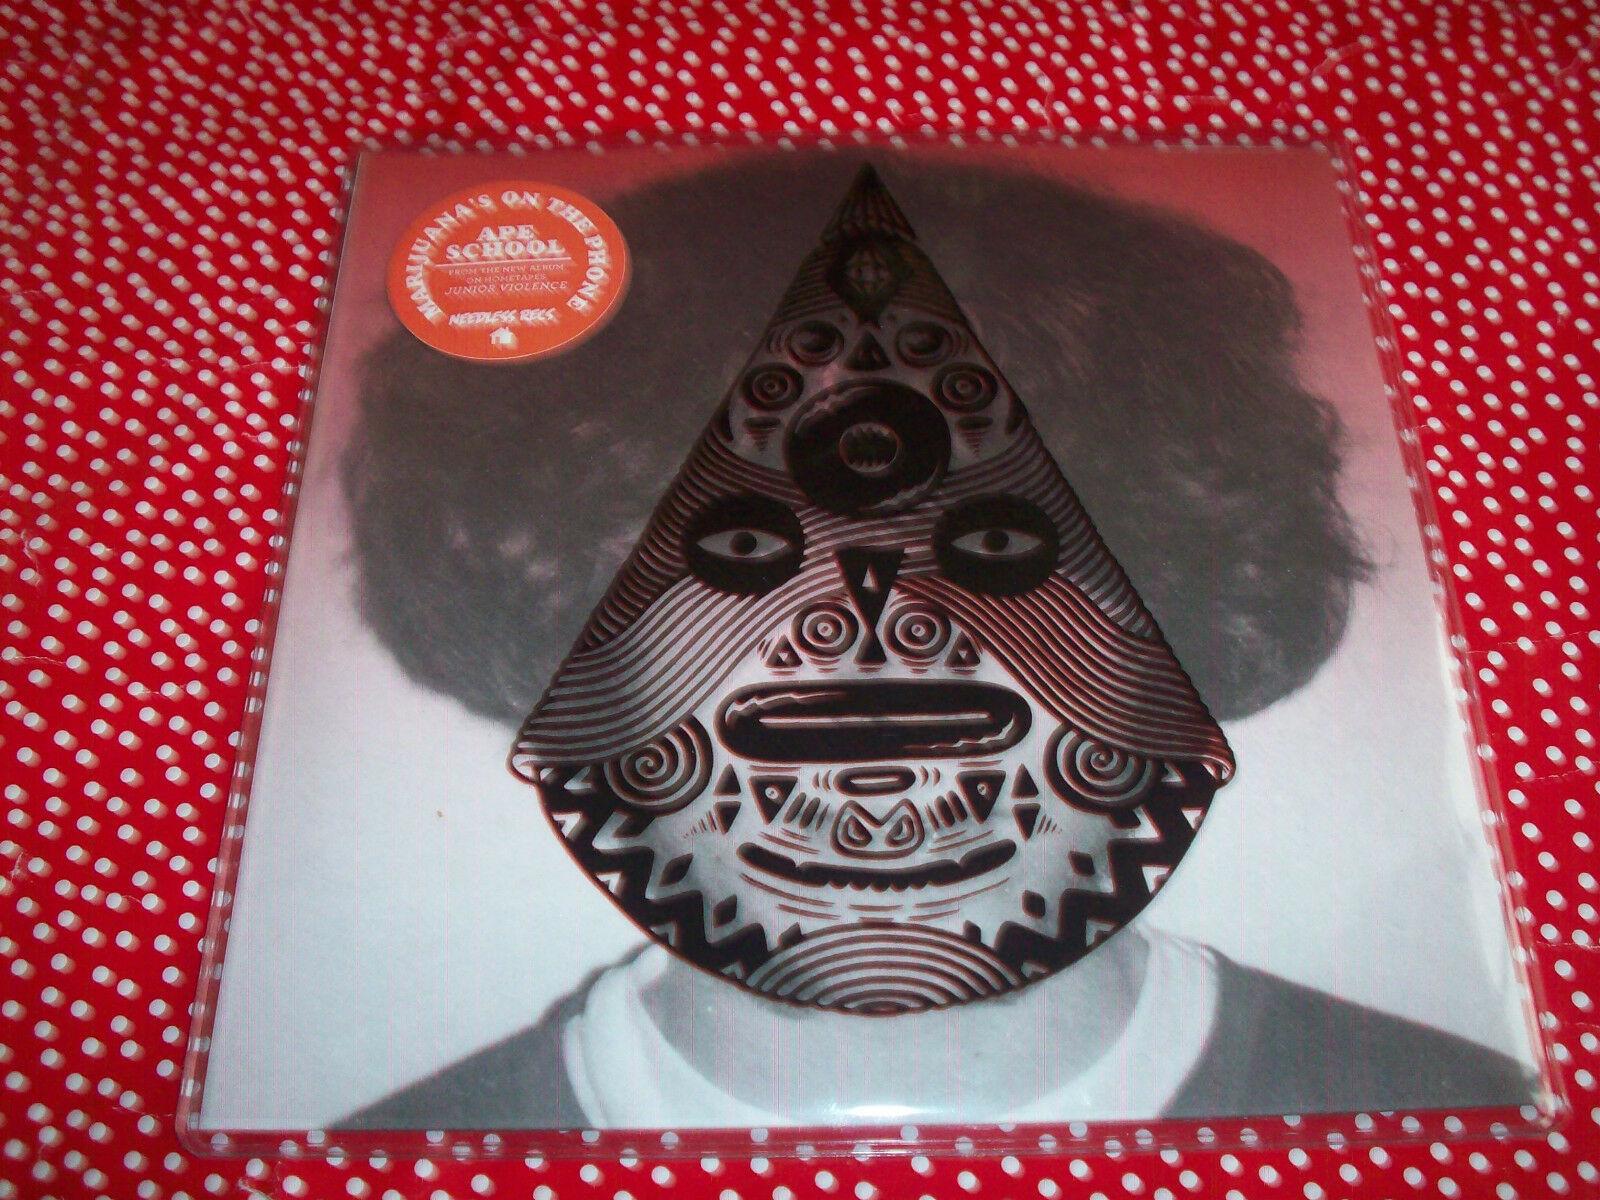 "Ape School- Marijuana's On The Phone 7"" Vinyl 45 RPM Single NEW 1"